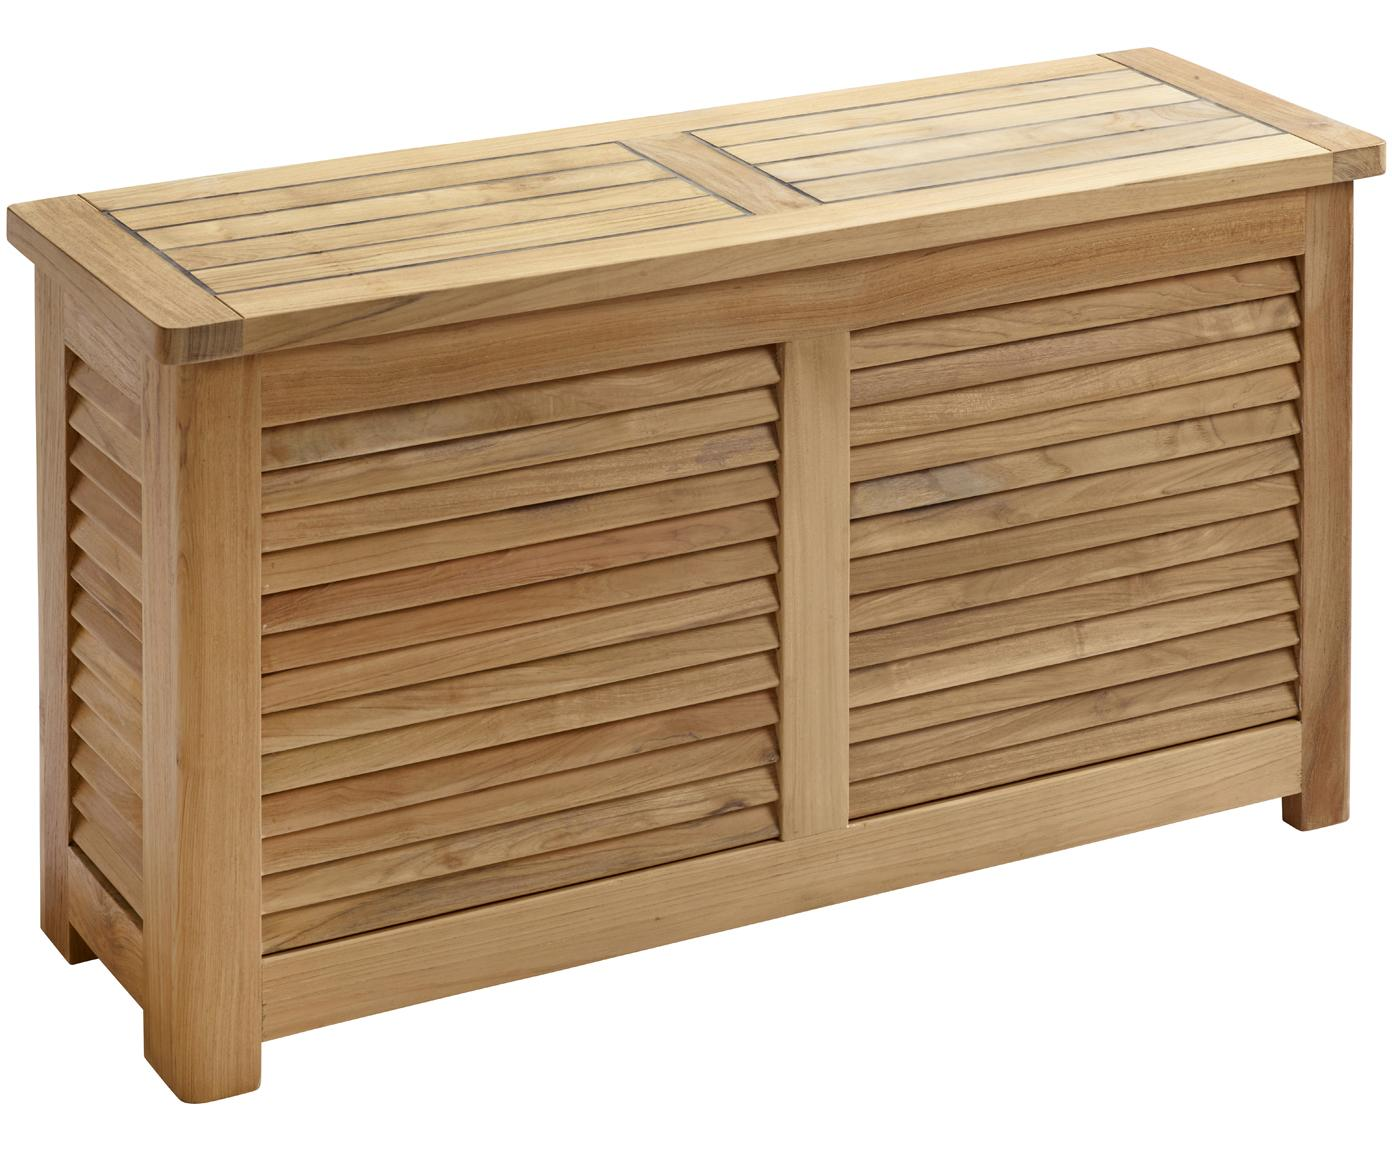 Smalle tuinbox Storage van hout, Frame: gepolijst teakhout, Teakhoutkleurig, 90 x 48 cm